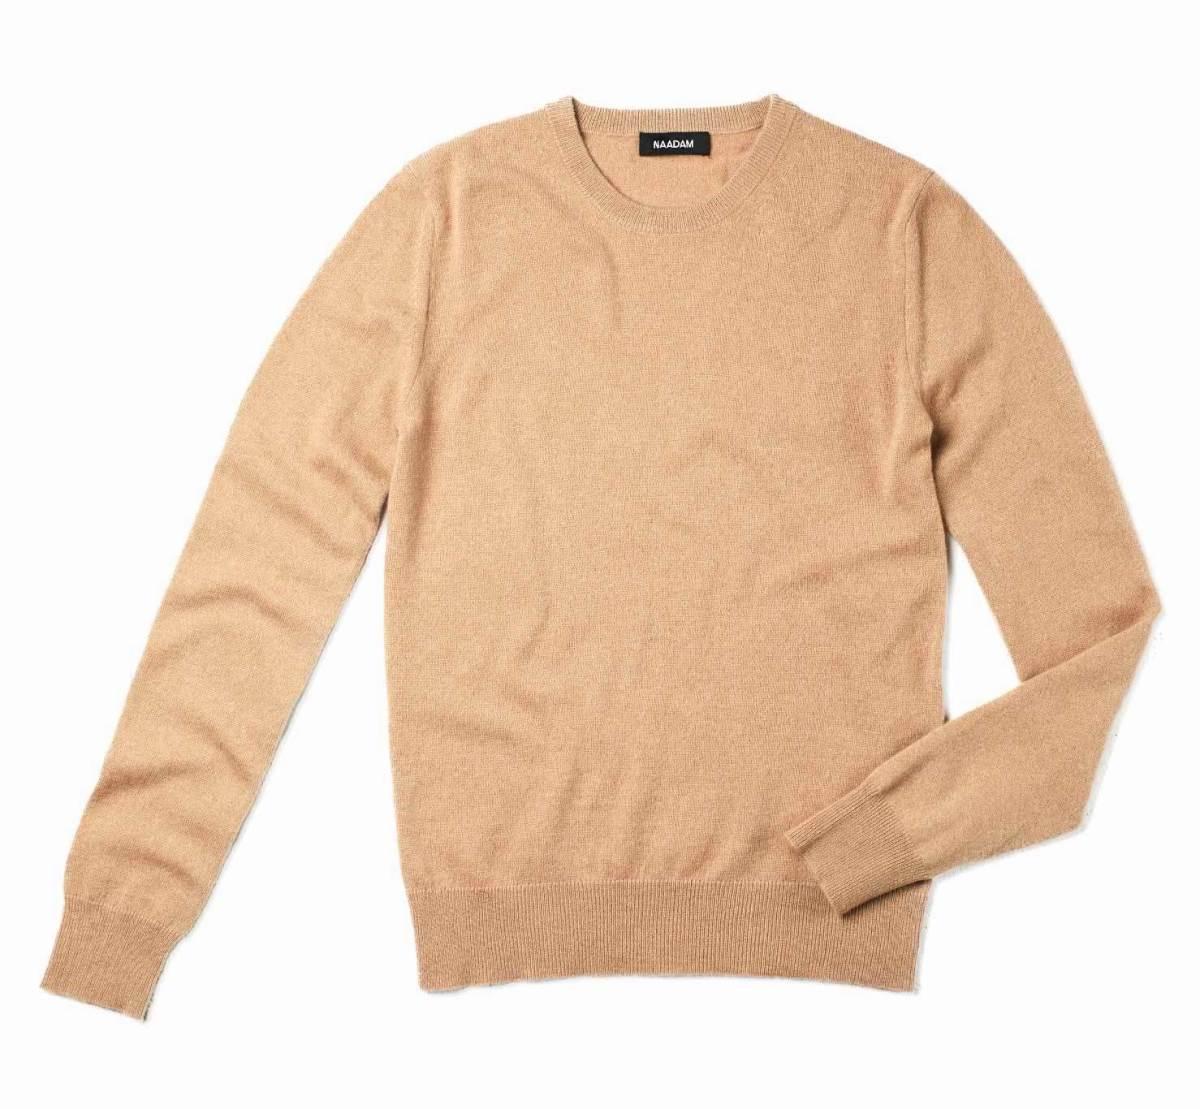 Nadaam Essential Cashmere Sweater